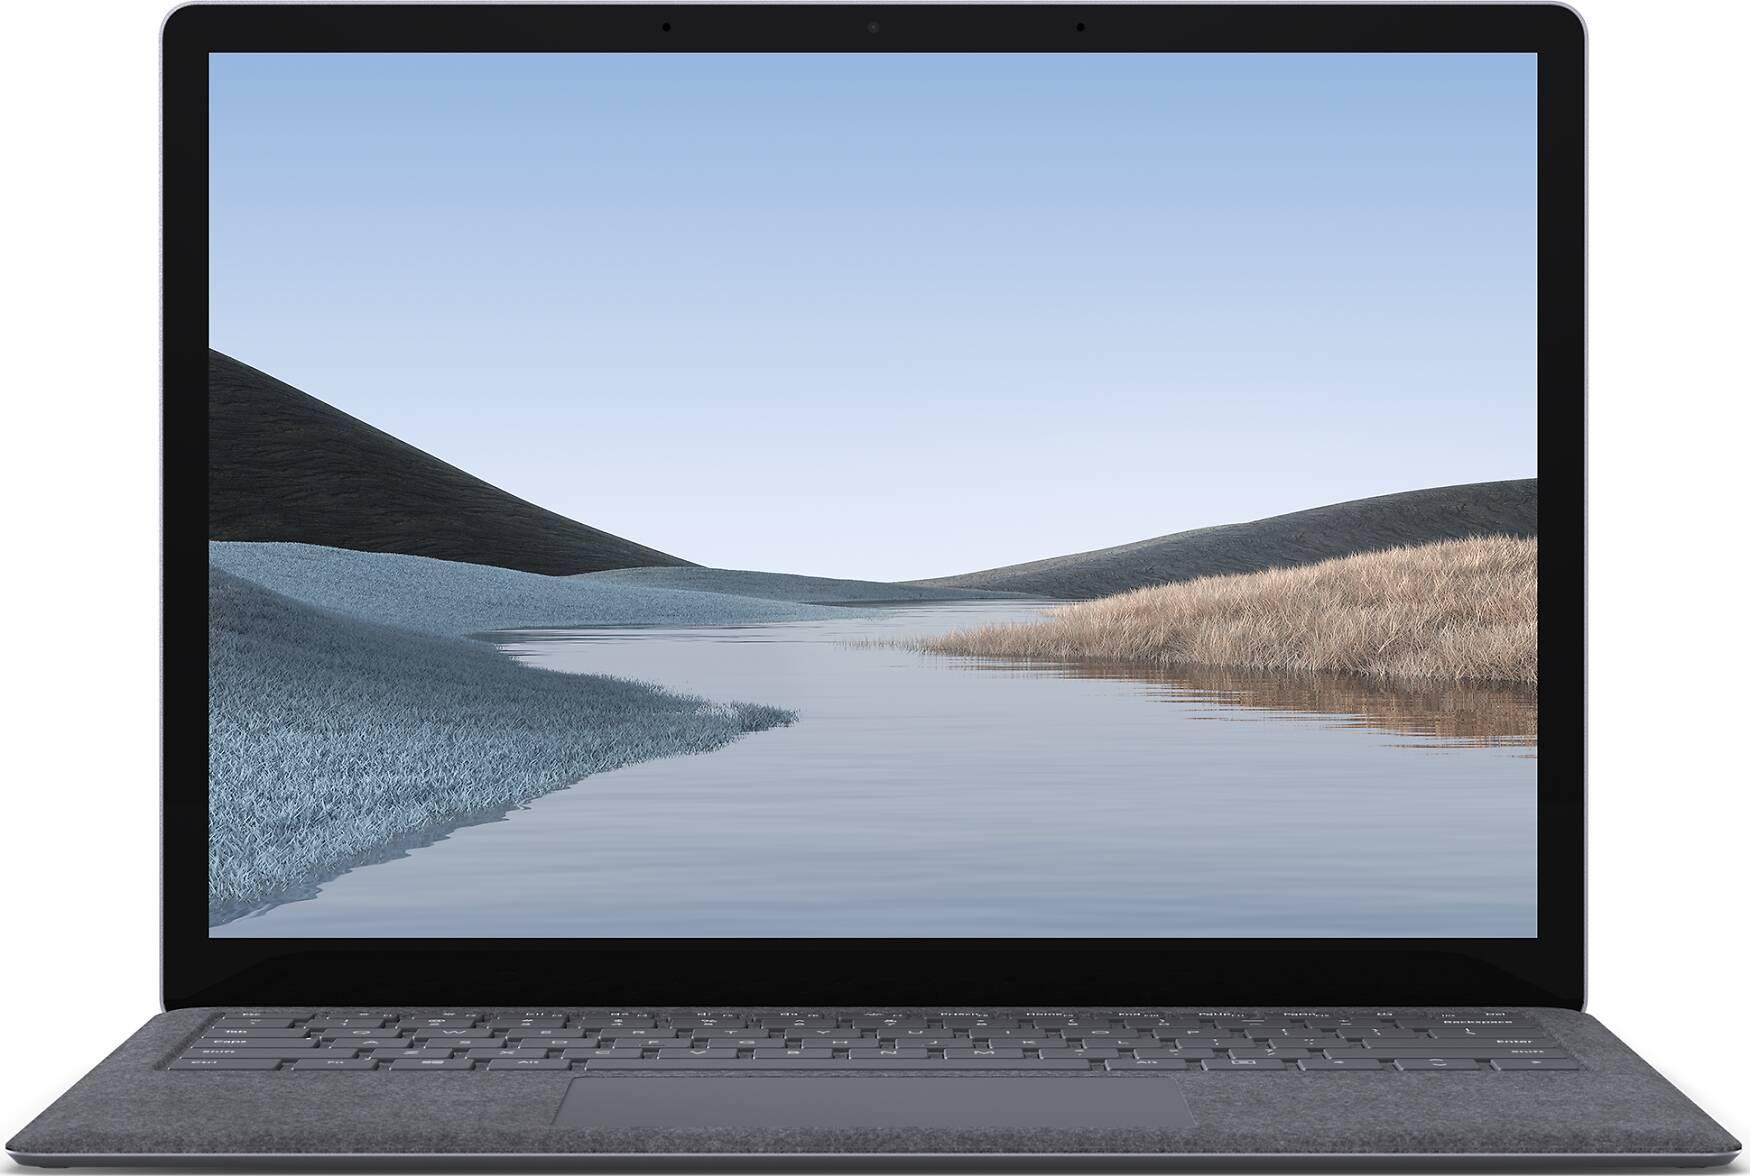 Microsoft Surface Laptop 3 15 Zoll, Core i5, 8GB RAM, 128GB SSD, Platin